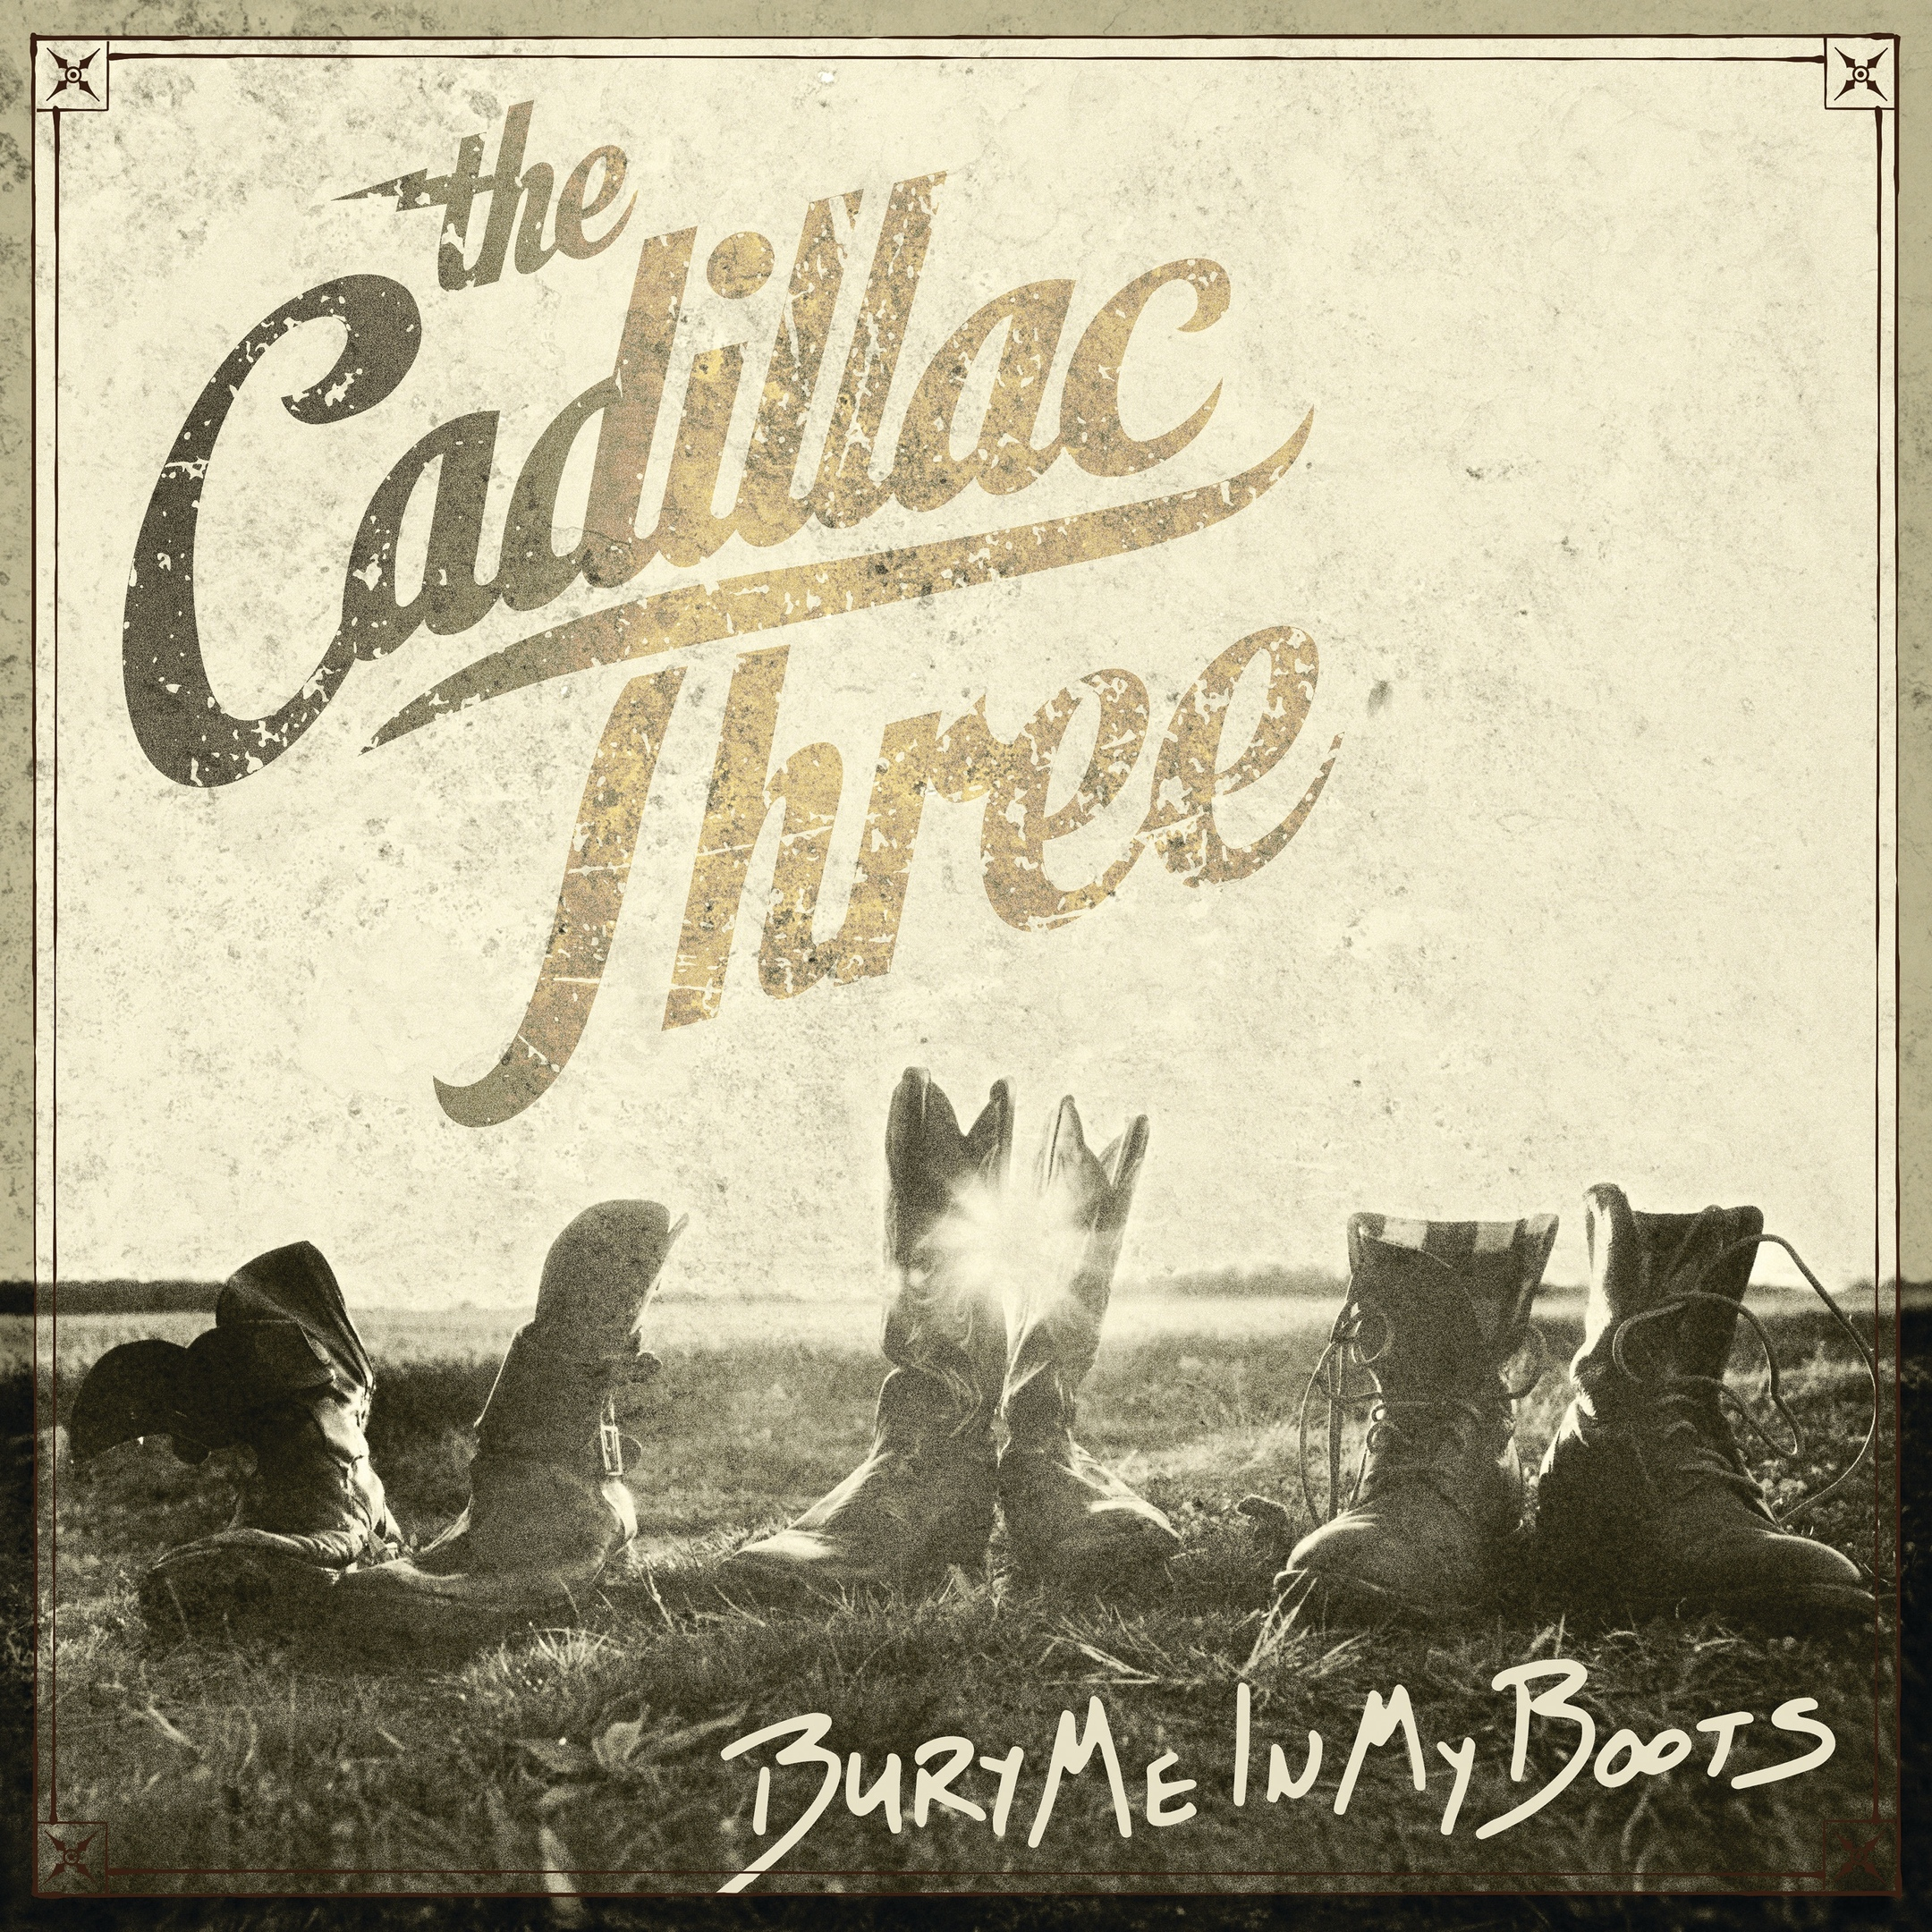 The Cadillac Three album Bury Me In My Boots